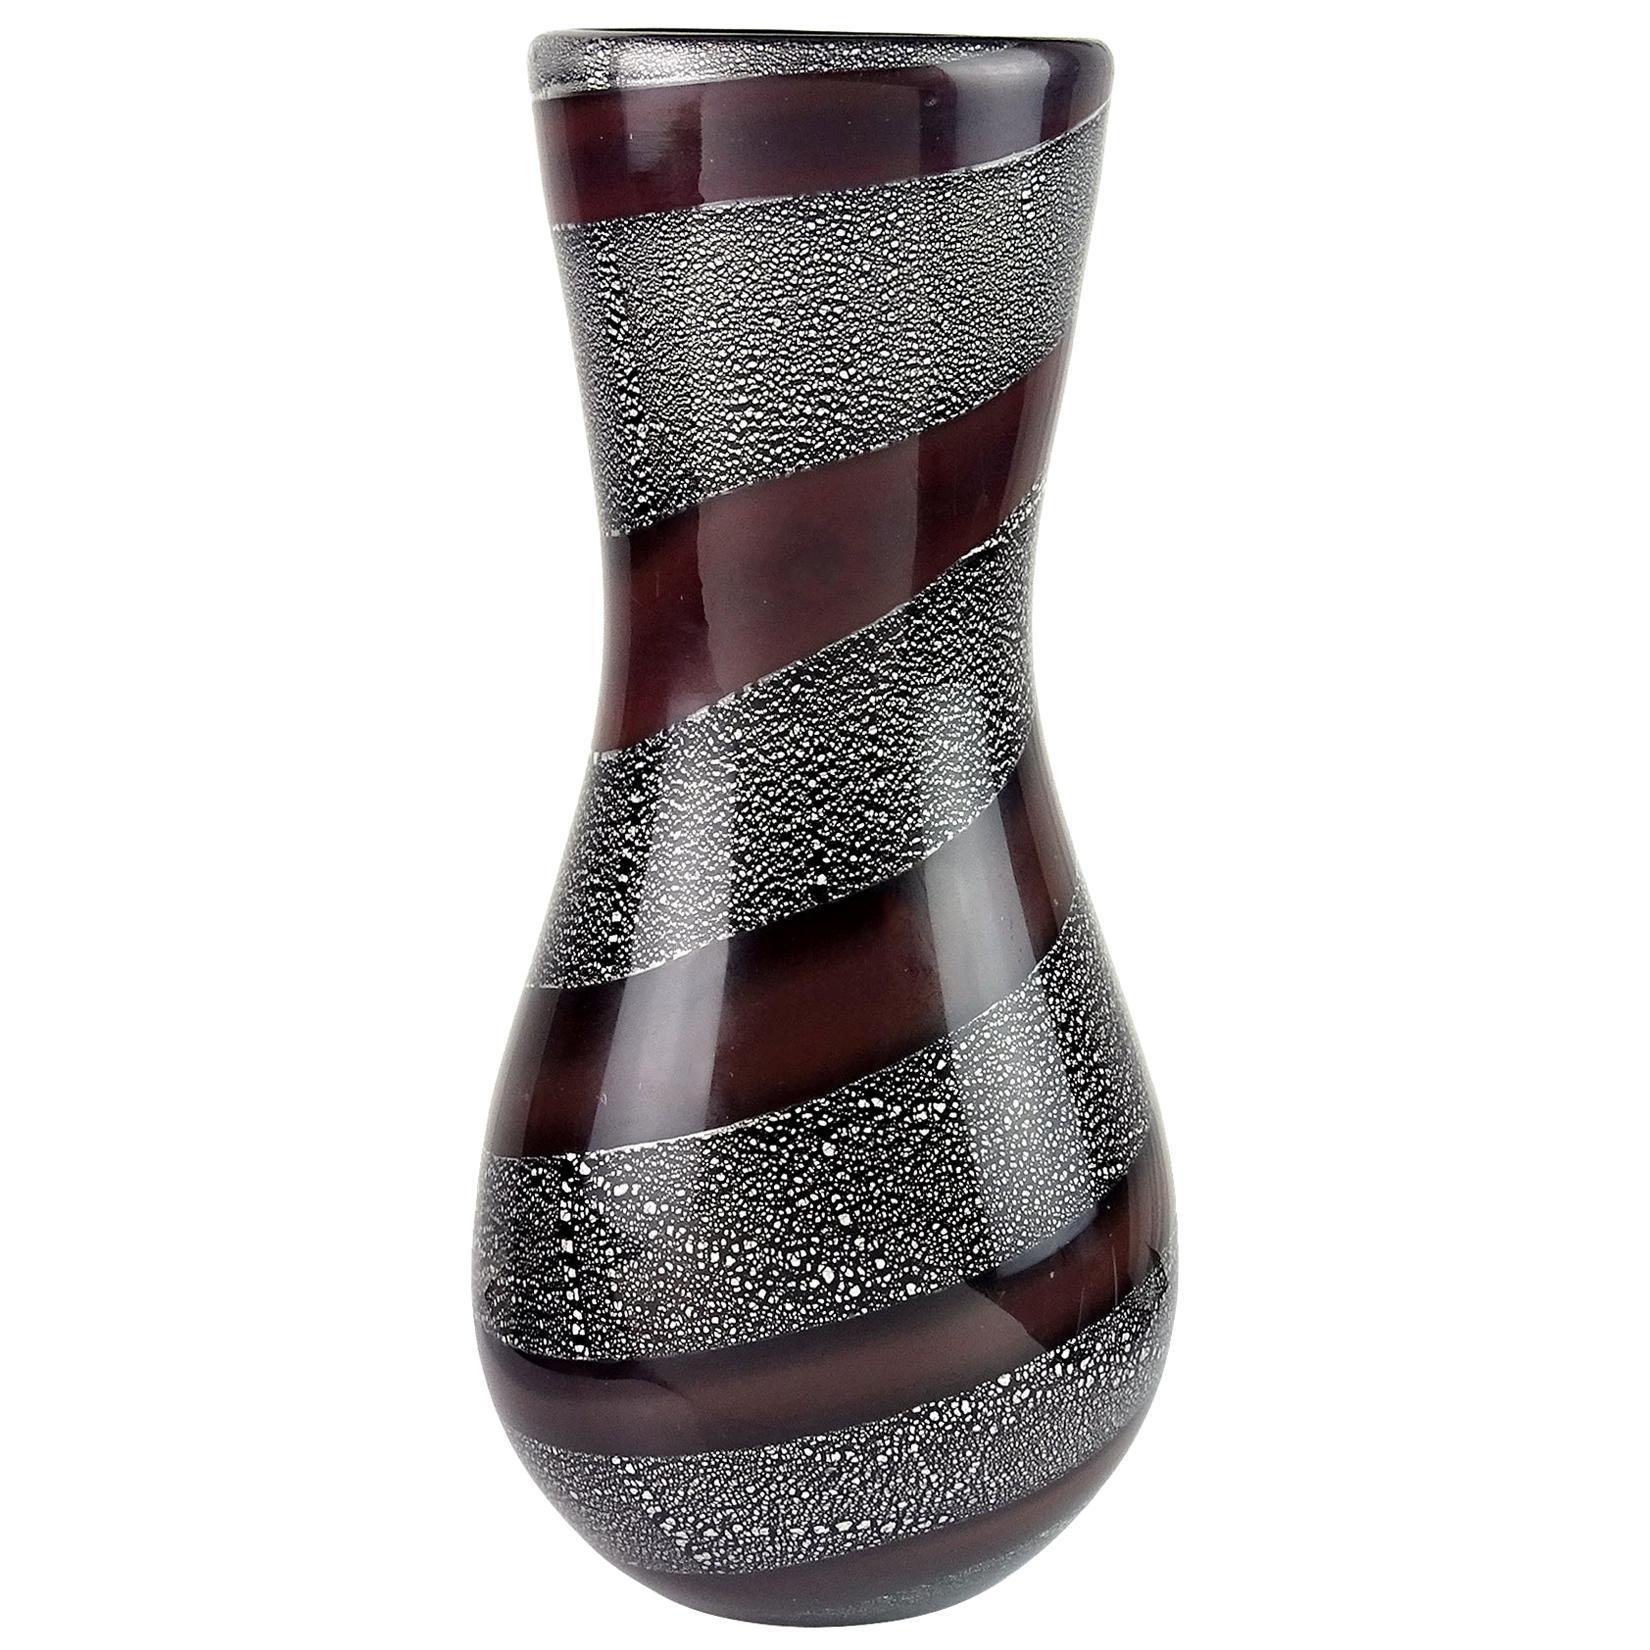 Giulio Radi A.Ve.M. Mauve Stripe Silver Leaf Black Italian Art Glass Flower Vase